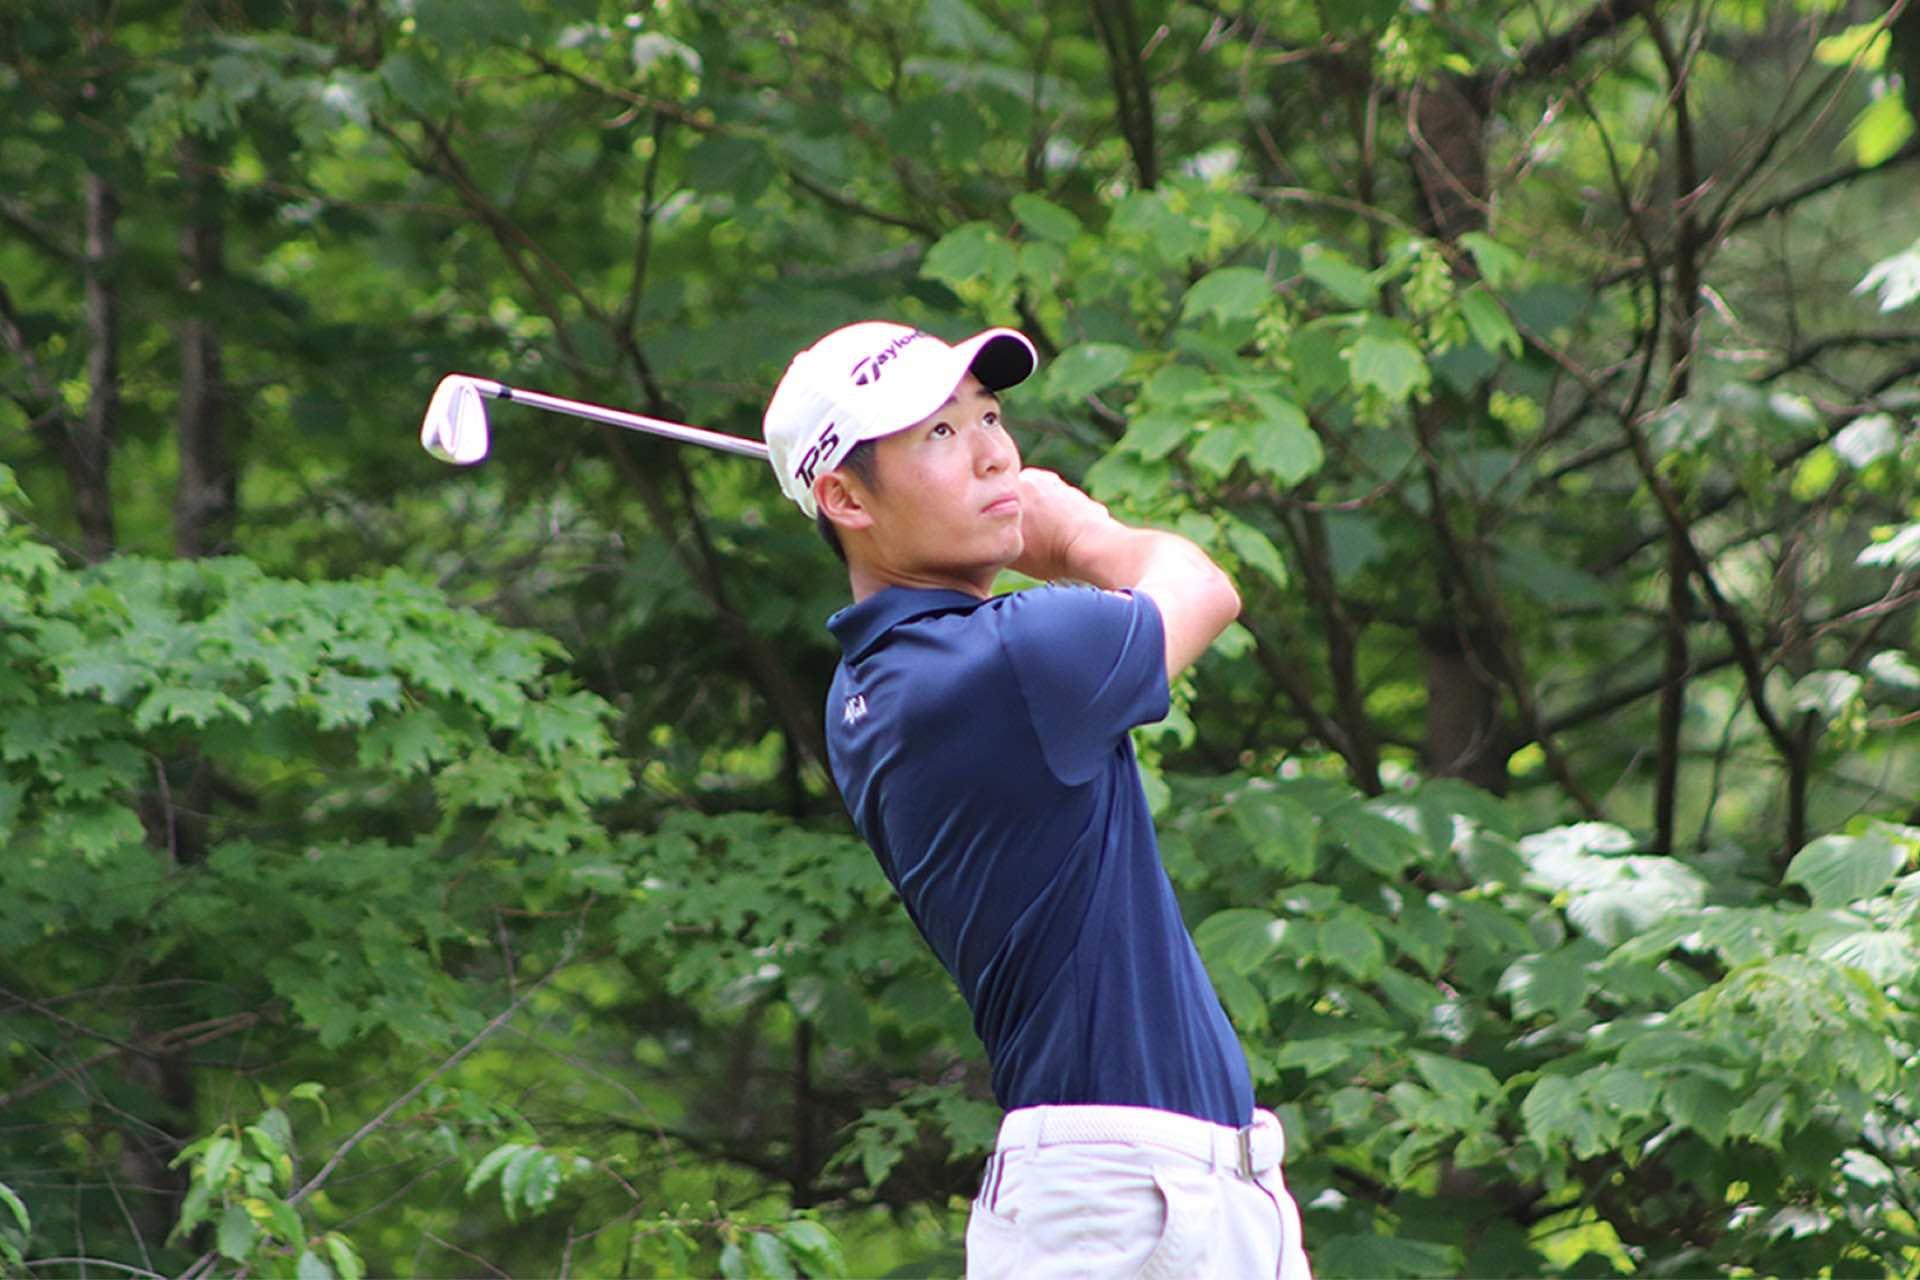 Cyrus Lee, AJGA Scholastic Junior All-America, swinging at the Killington Junior Golf Championship